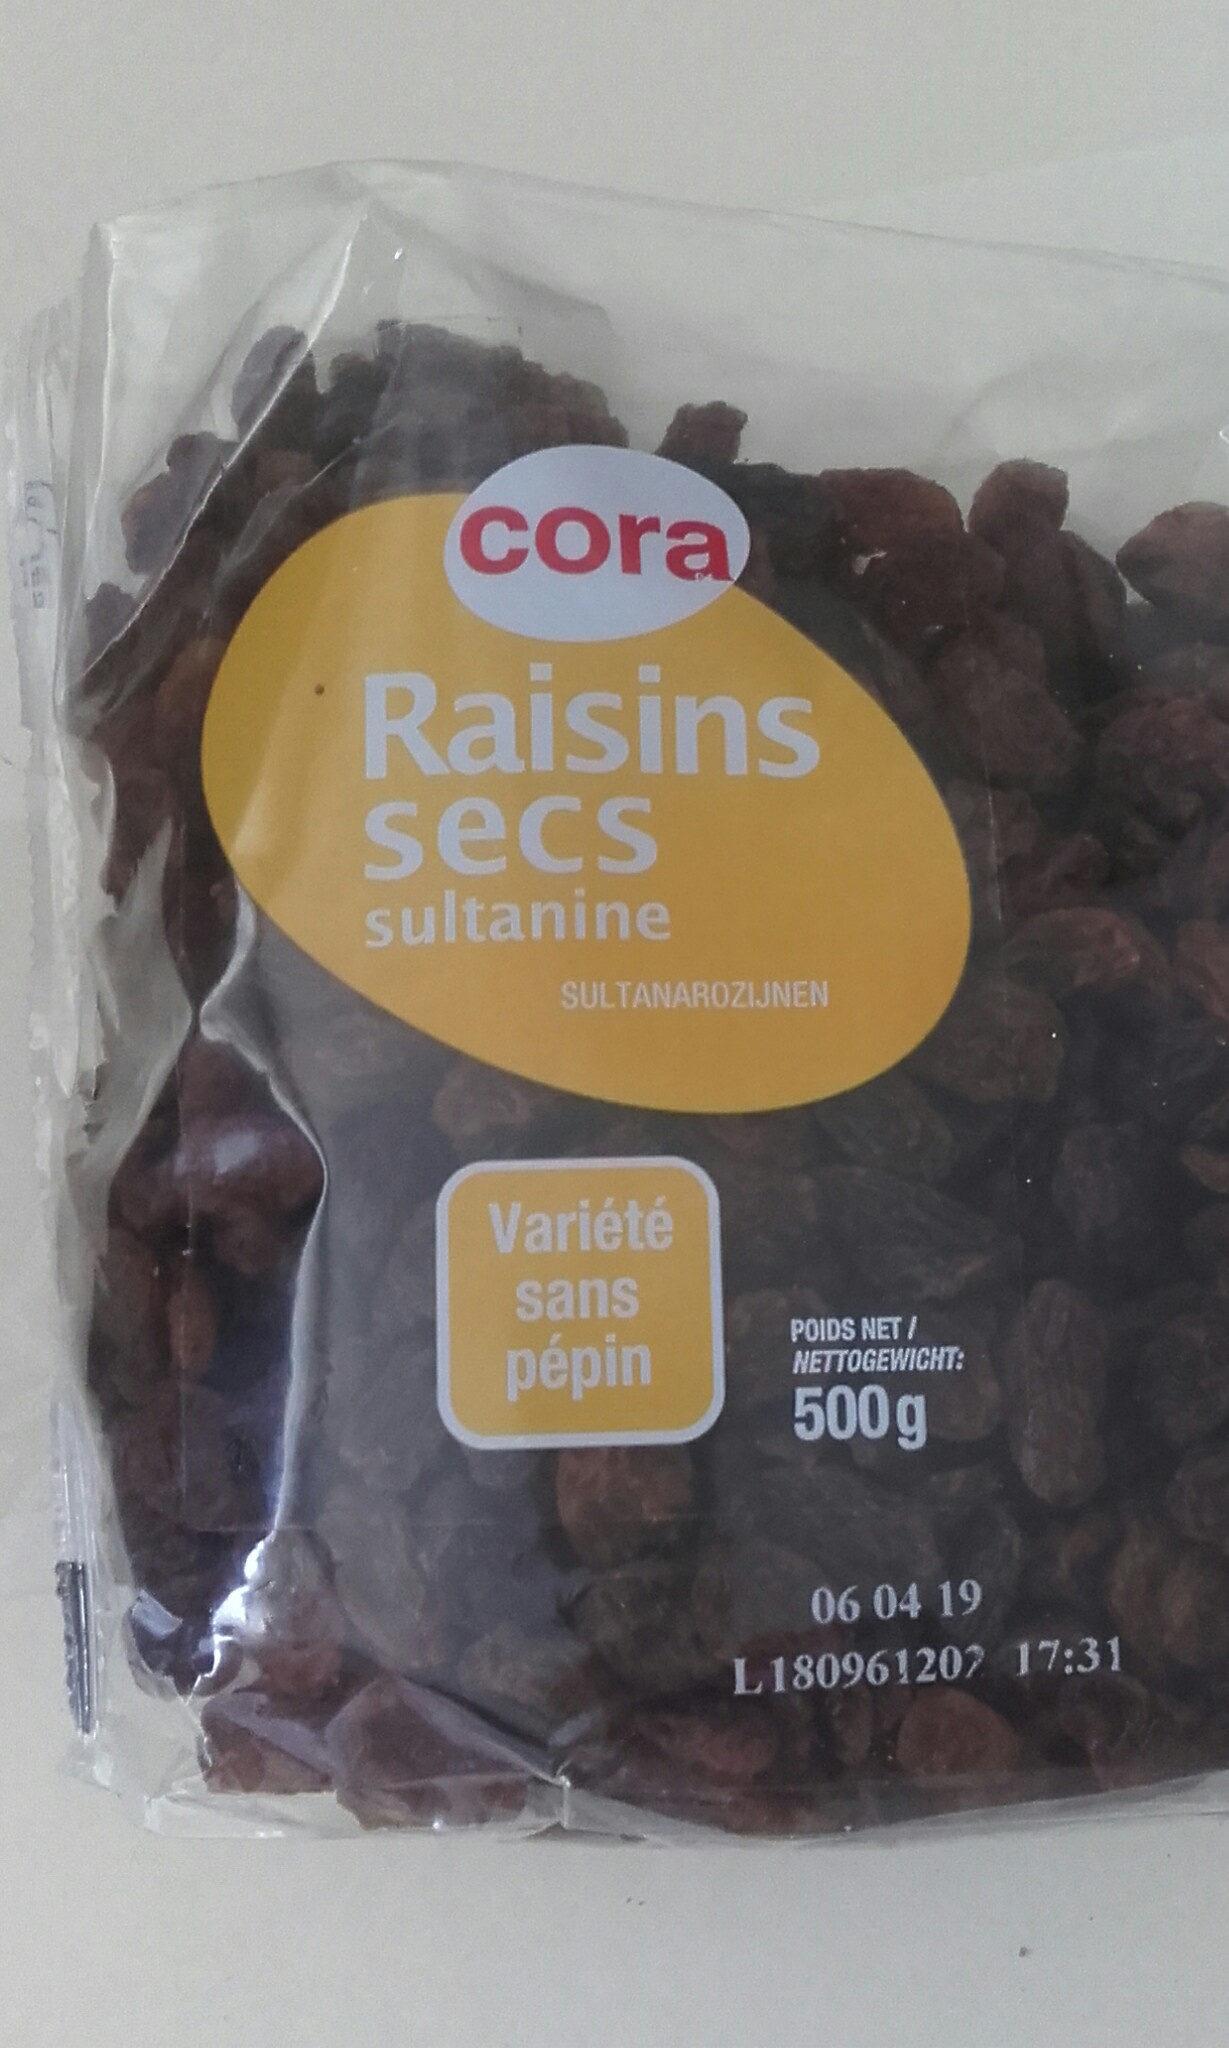 Raisins Secs Sultanines, 500 Grammes, Marque Cora - Product - fr